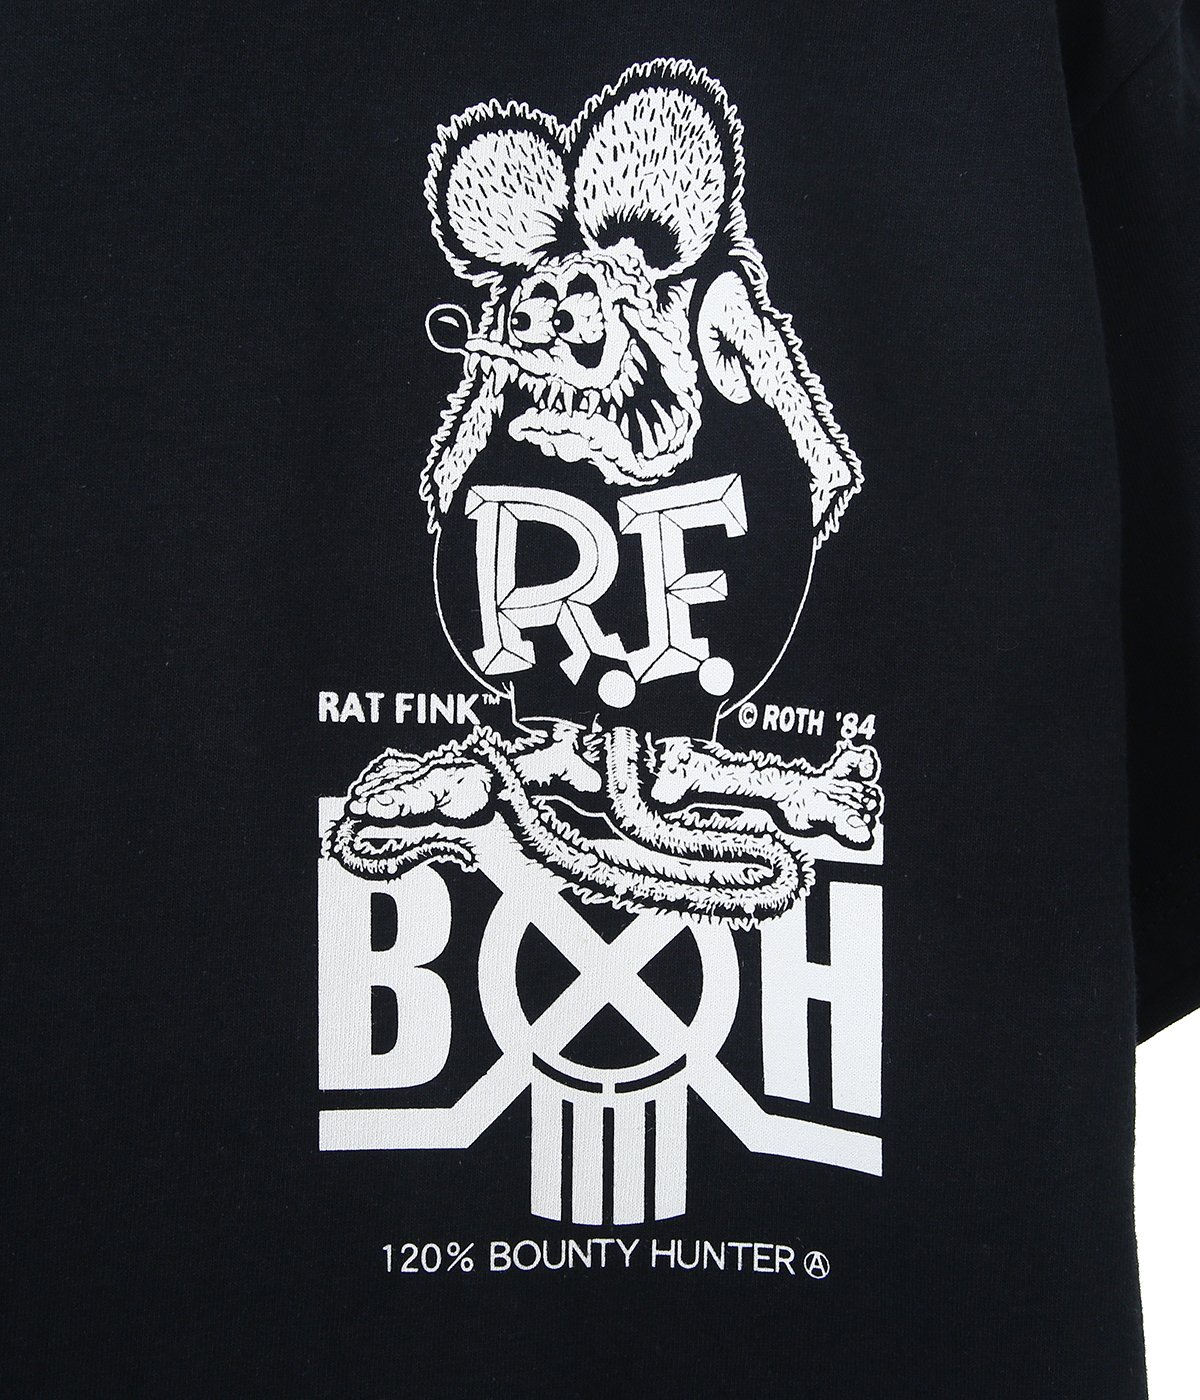 B×H / RATFINK / Tee